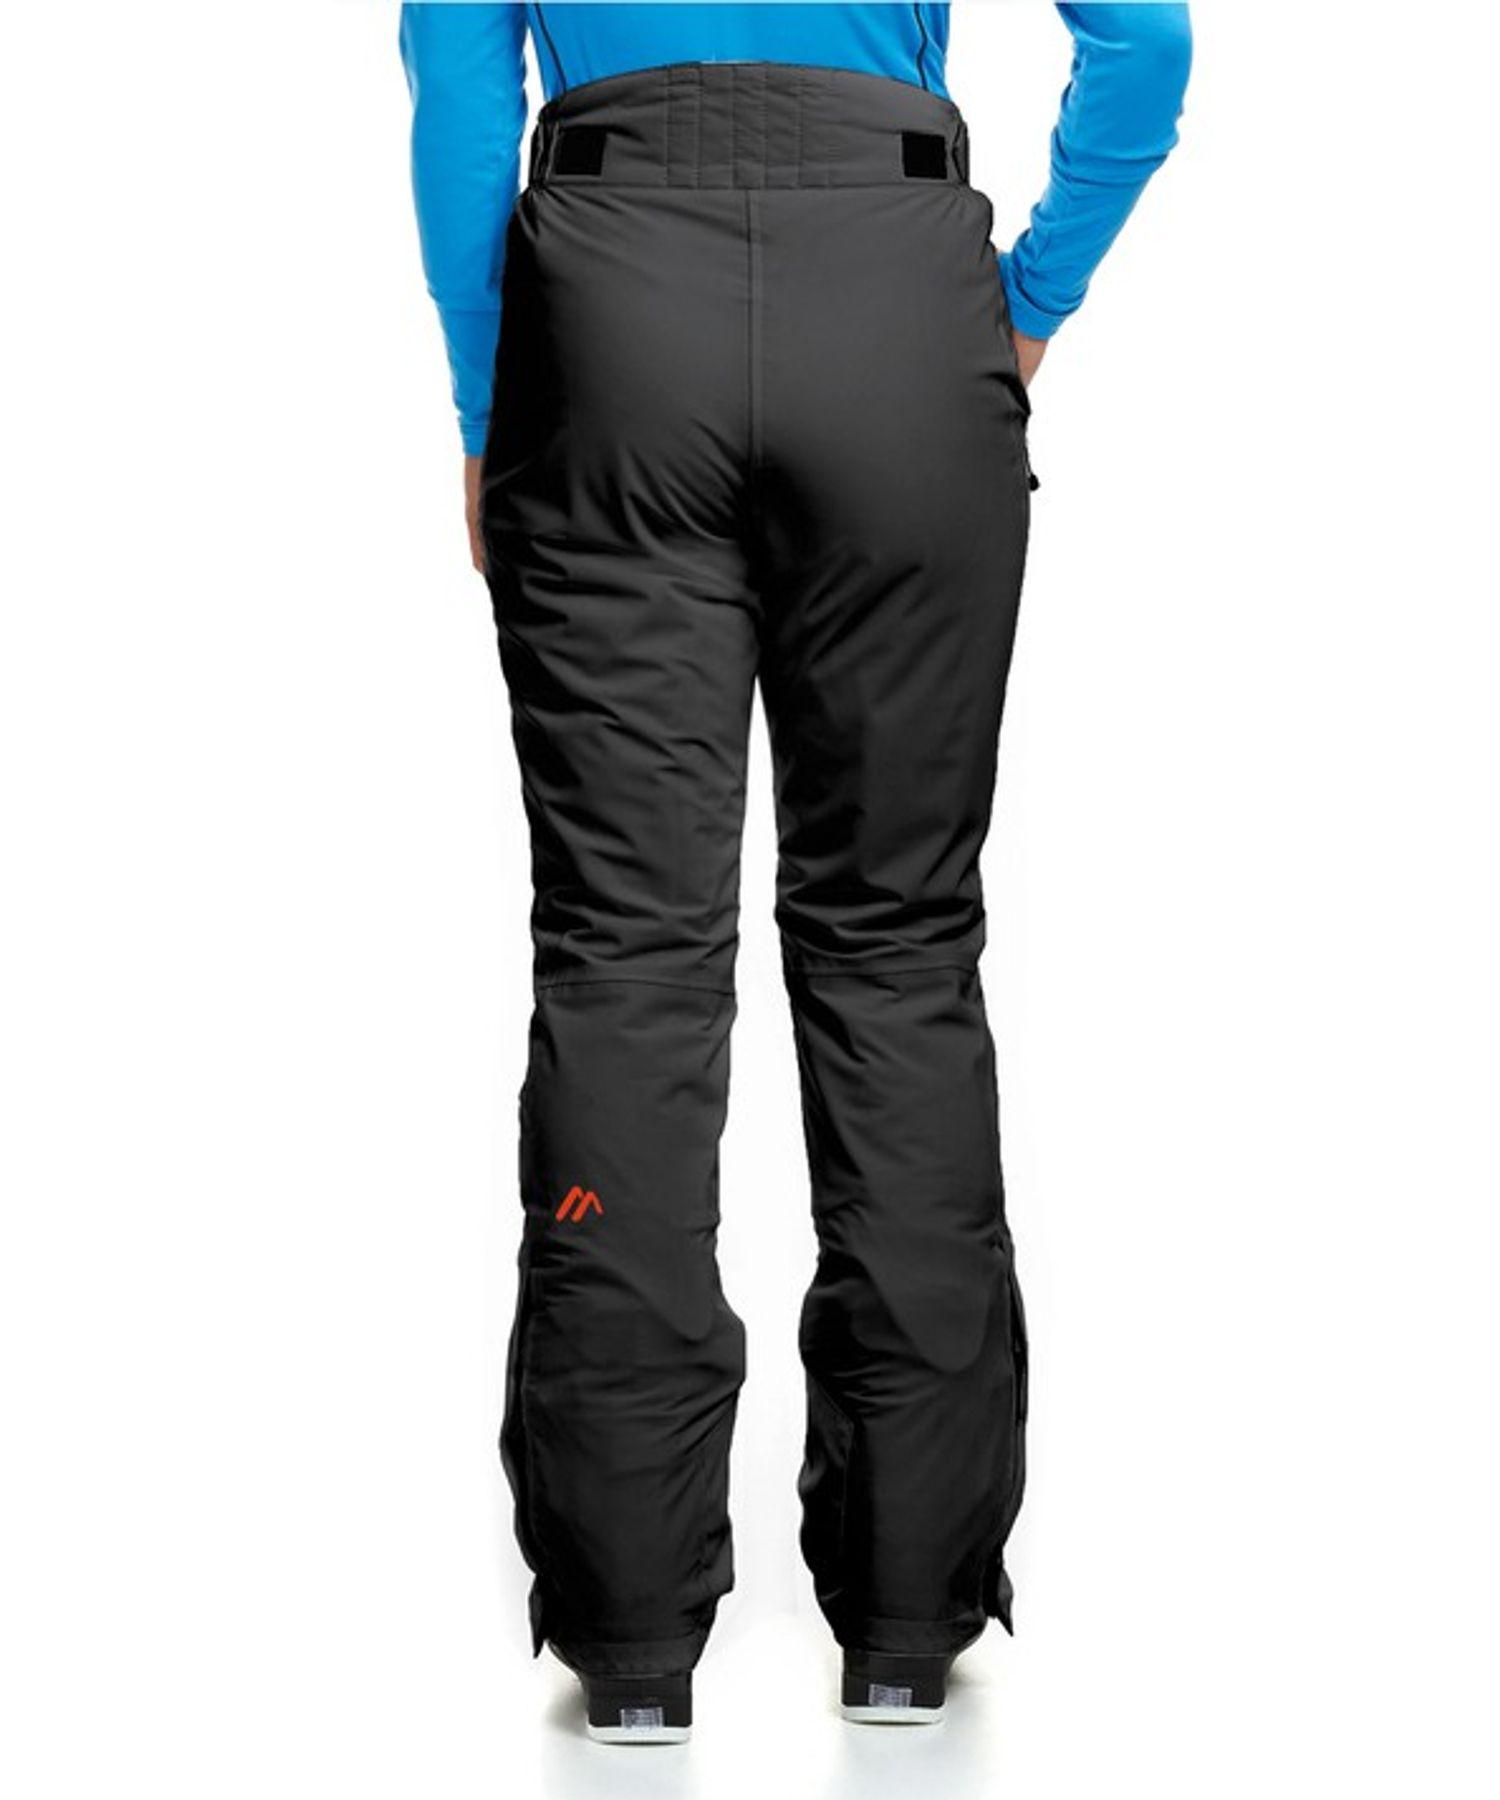 Maier Sports- Damen Ski Hose in Schwarz Artikel Vroni (200001) – Bild 2